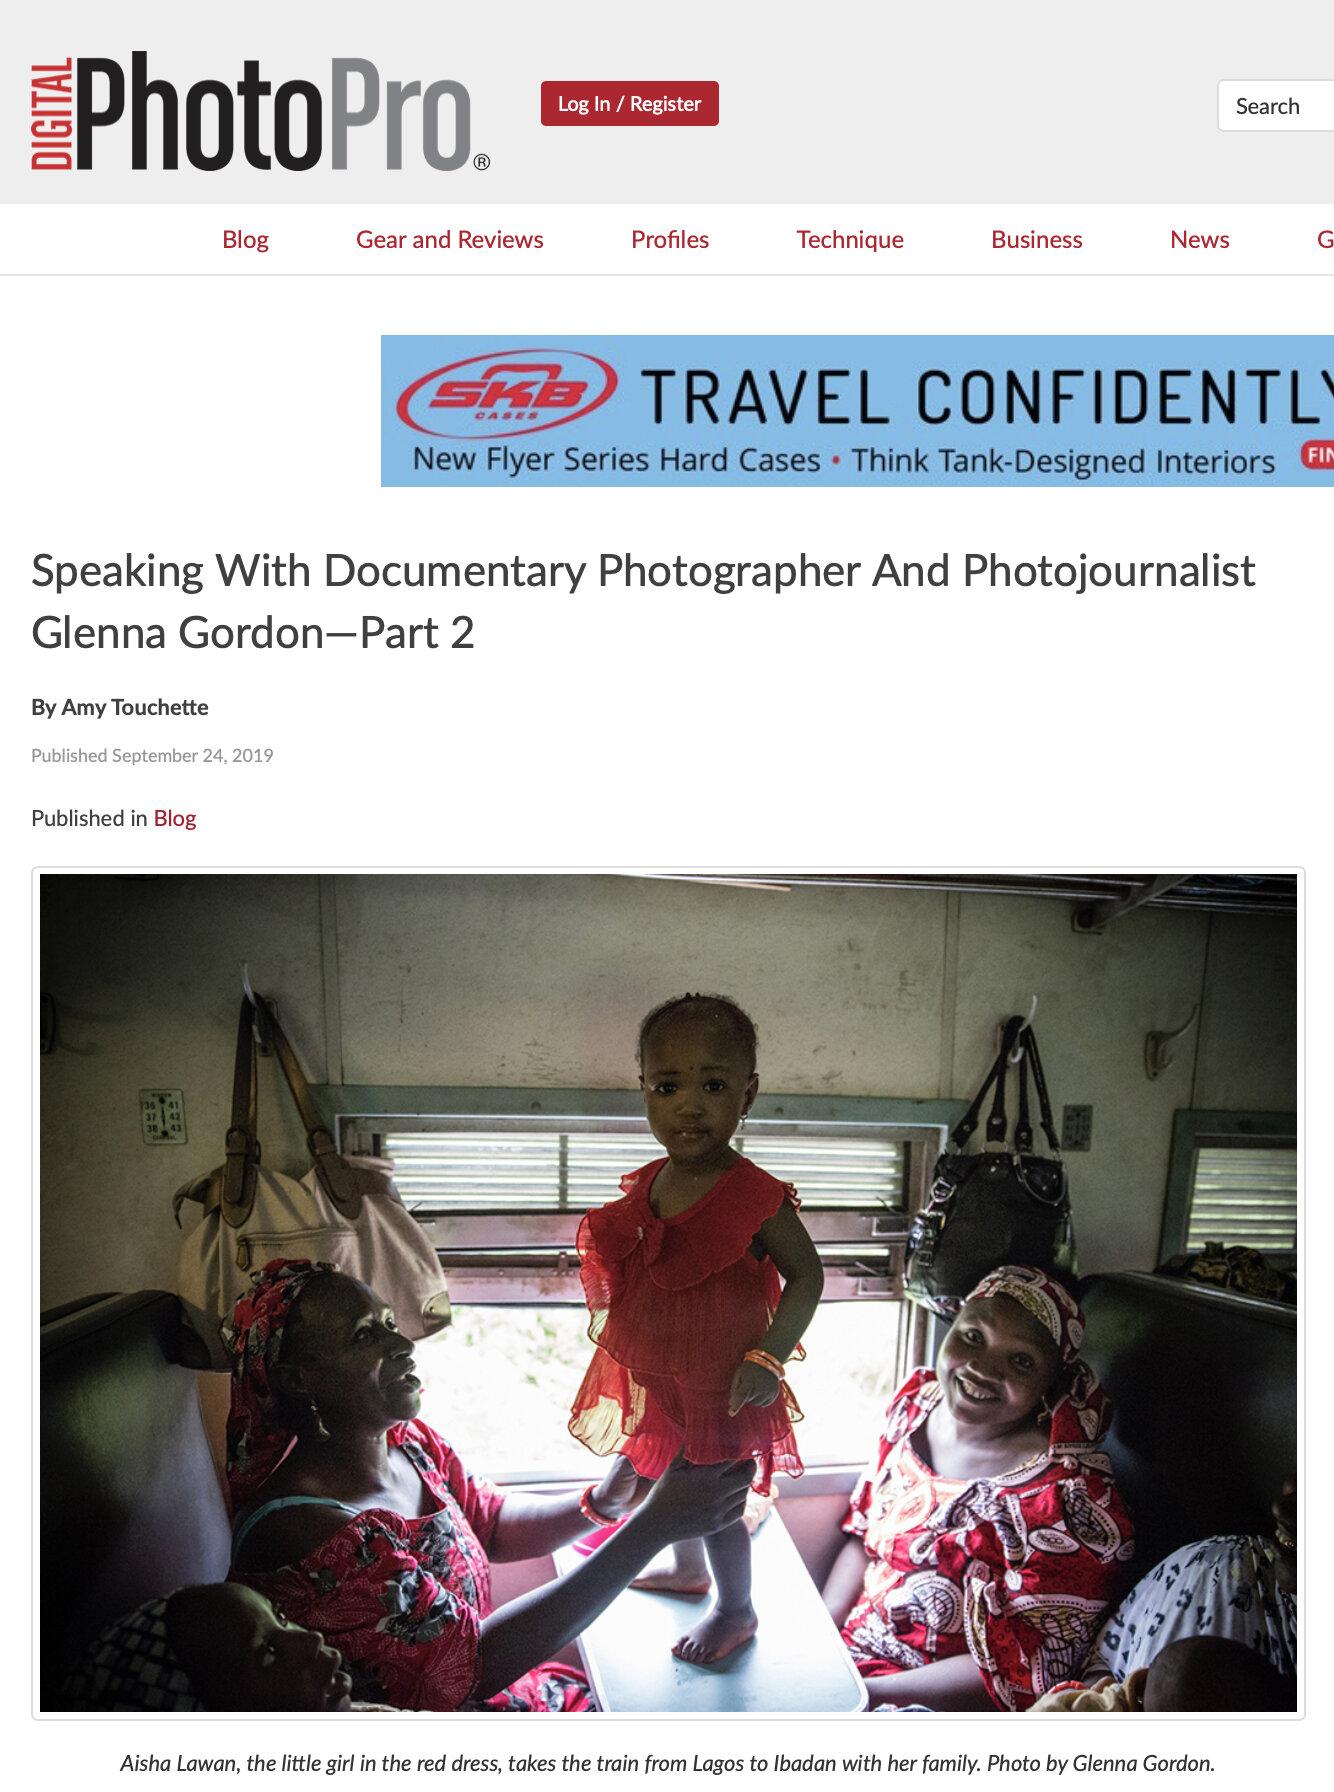 DPP Glenna Gordon_9.24.19.jpg